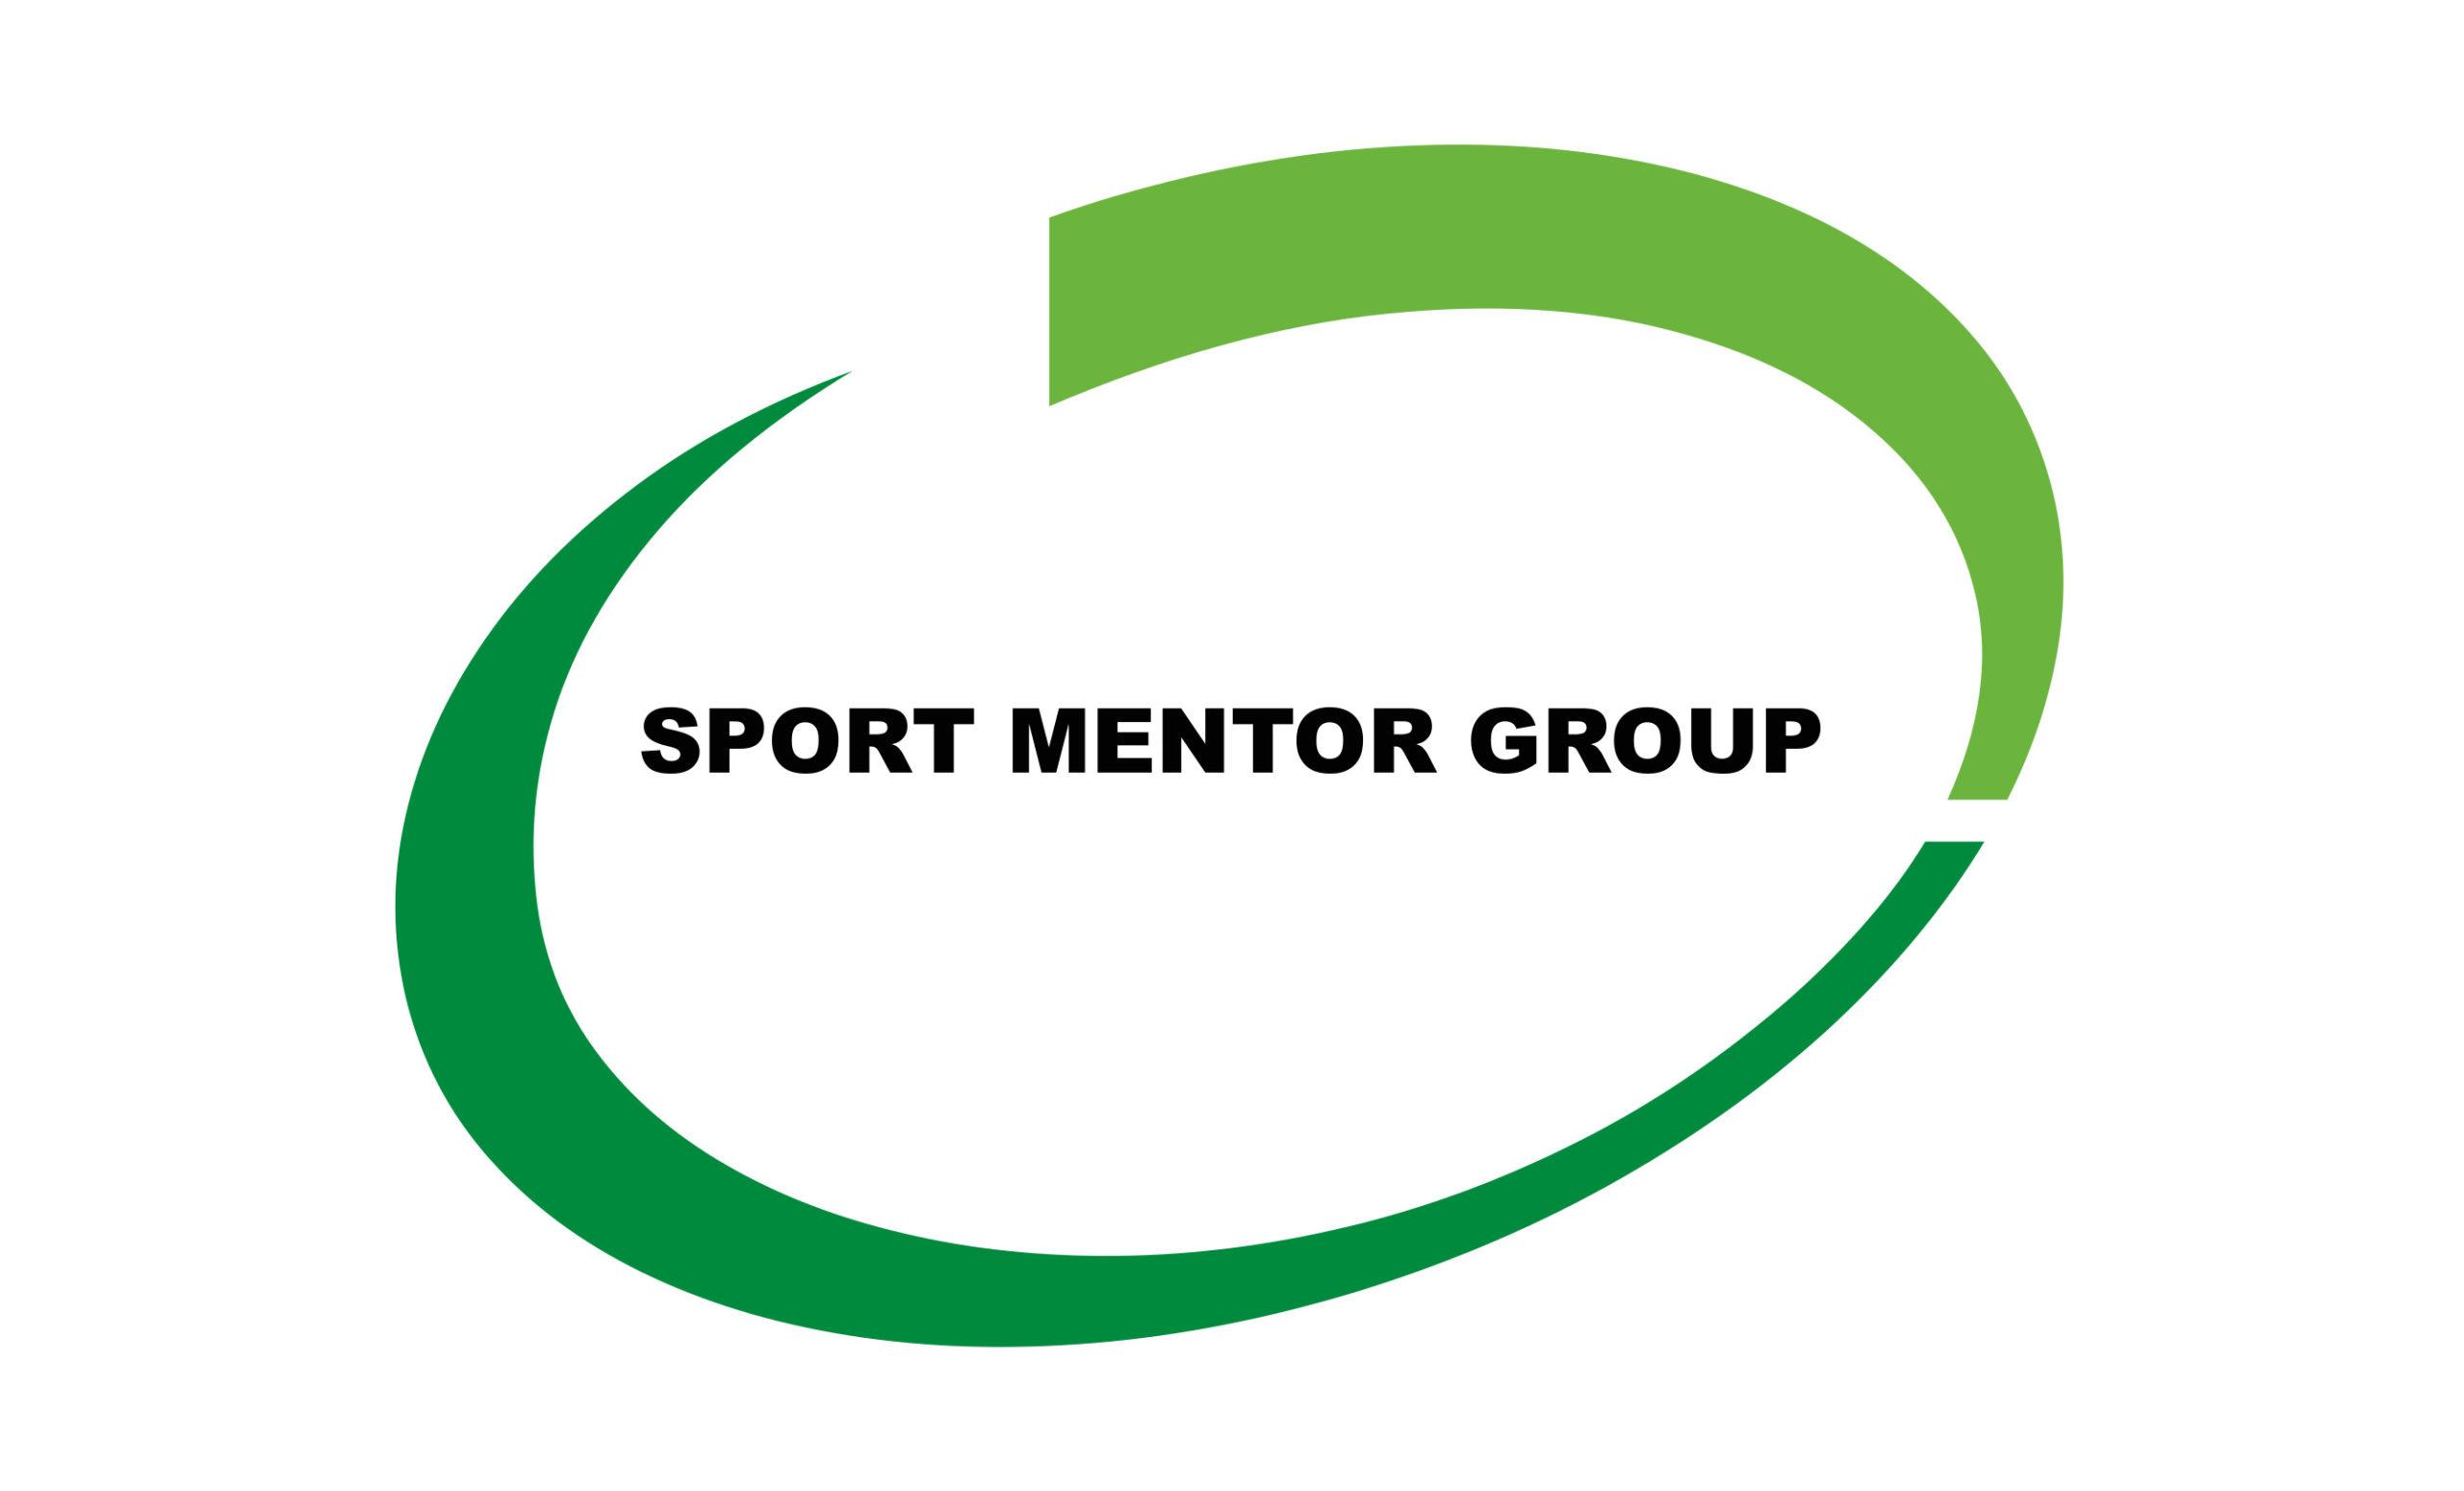 sport mentor group